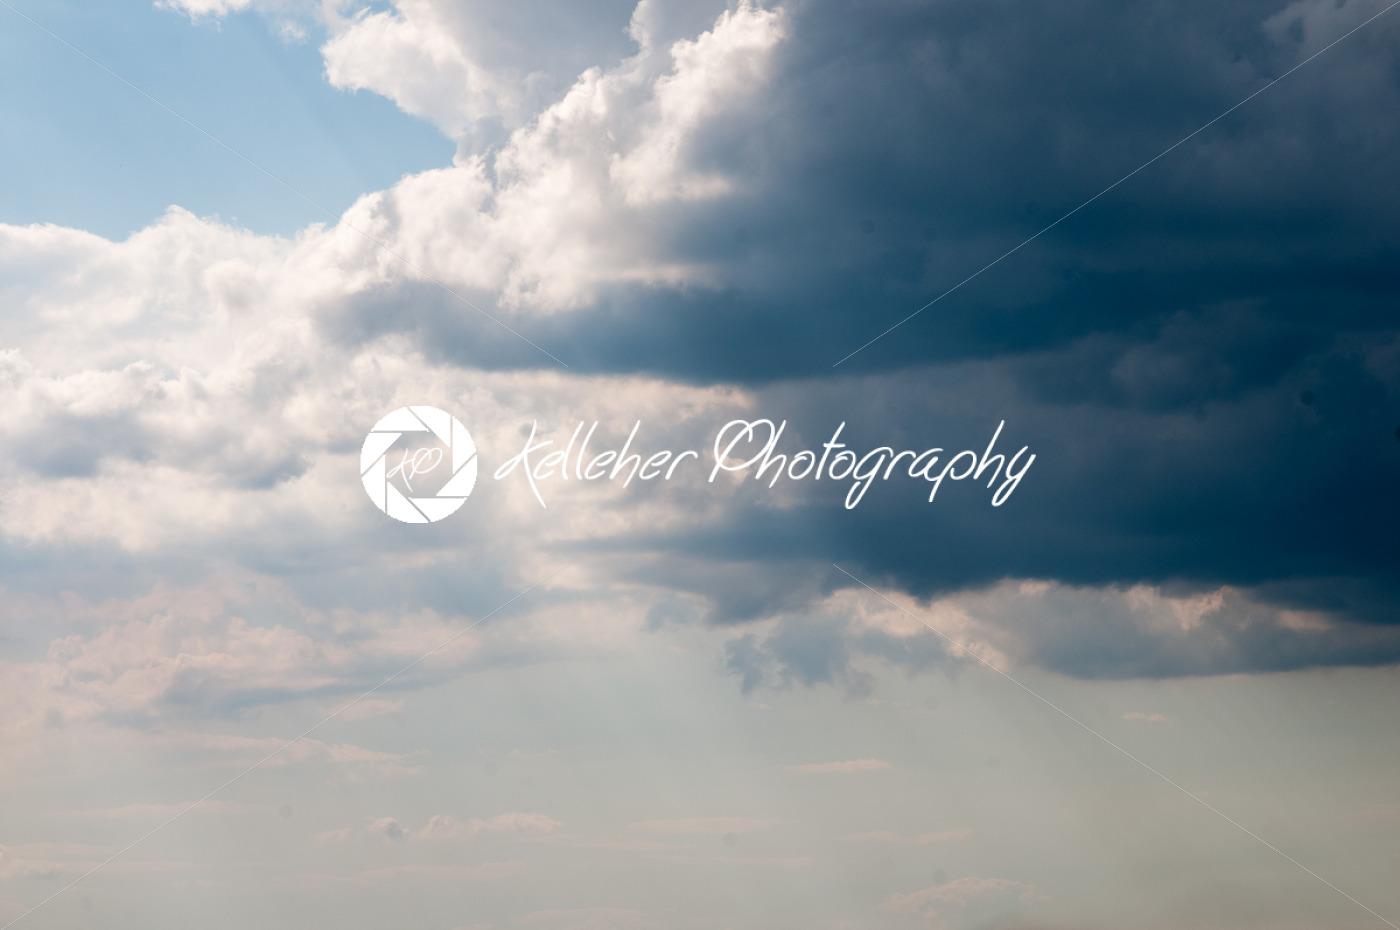 Dark storm clouds sky. Copy space below - Kelleher Photography Store